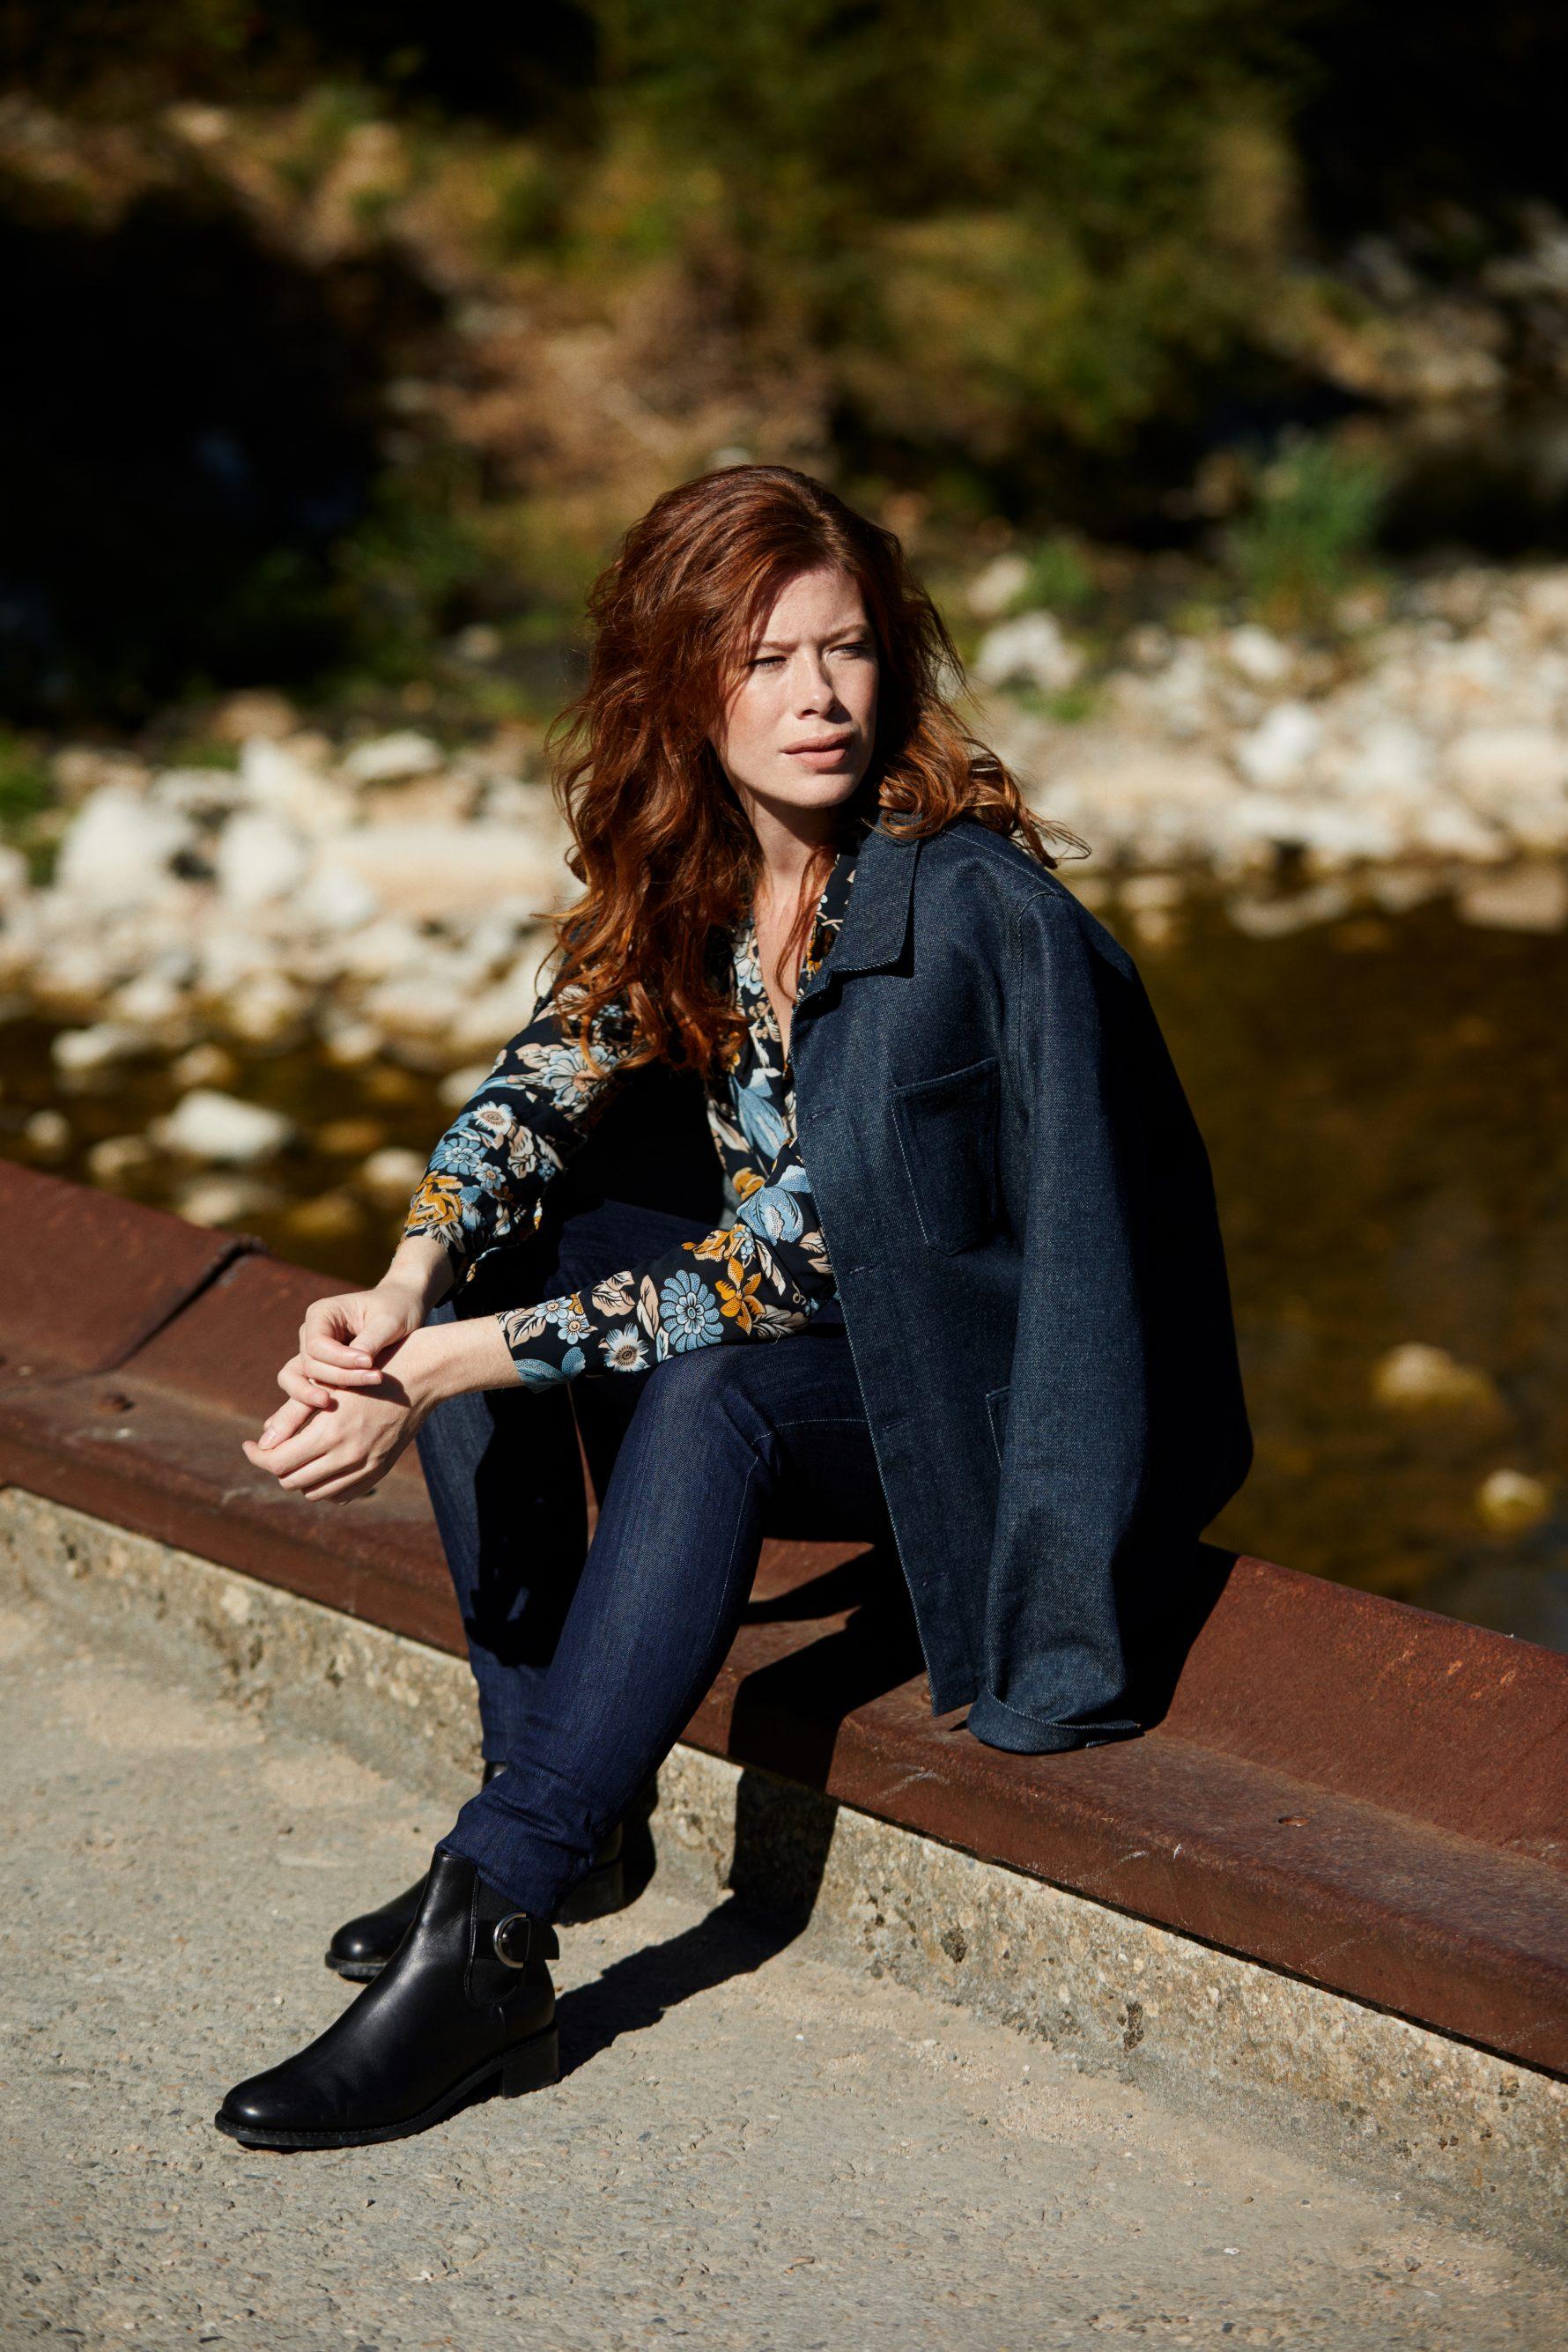 Veste Méjean femme brut laine et pantalon jean femme Marianne brut bio